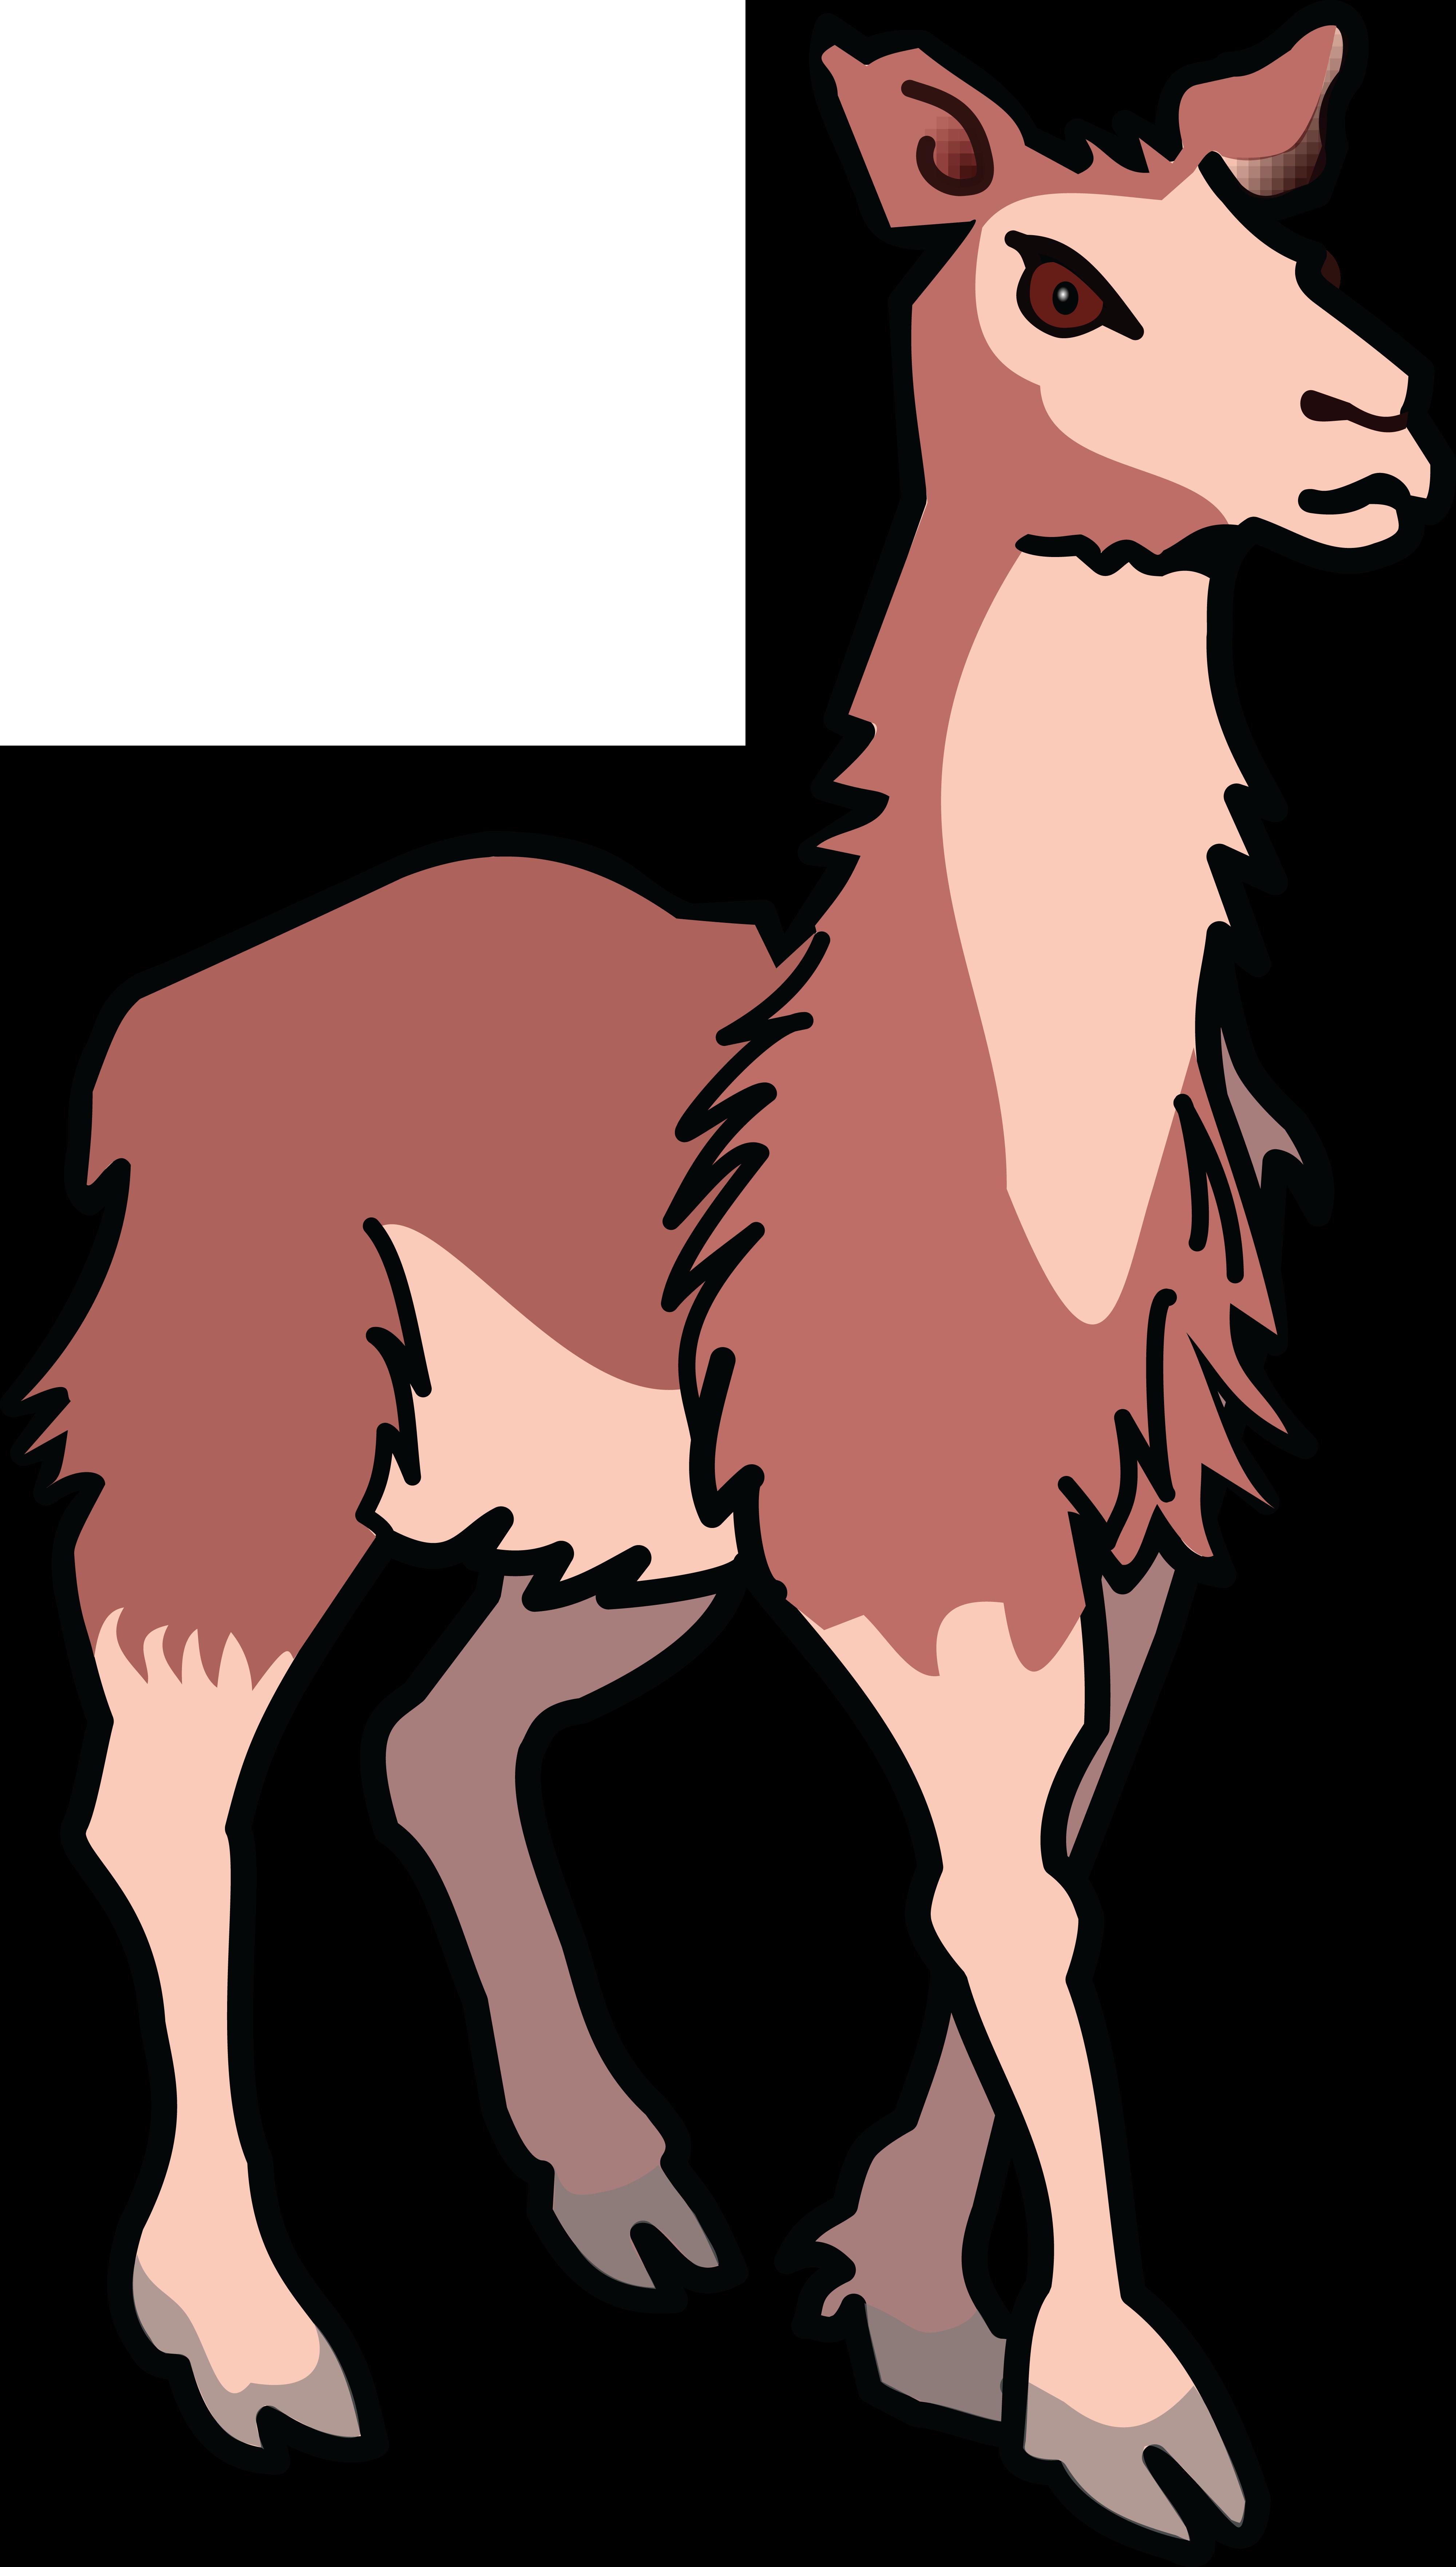 free clipart of a llama rh free clipartof com llama clipart free llama clipart outline